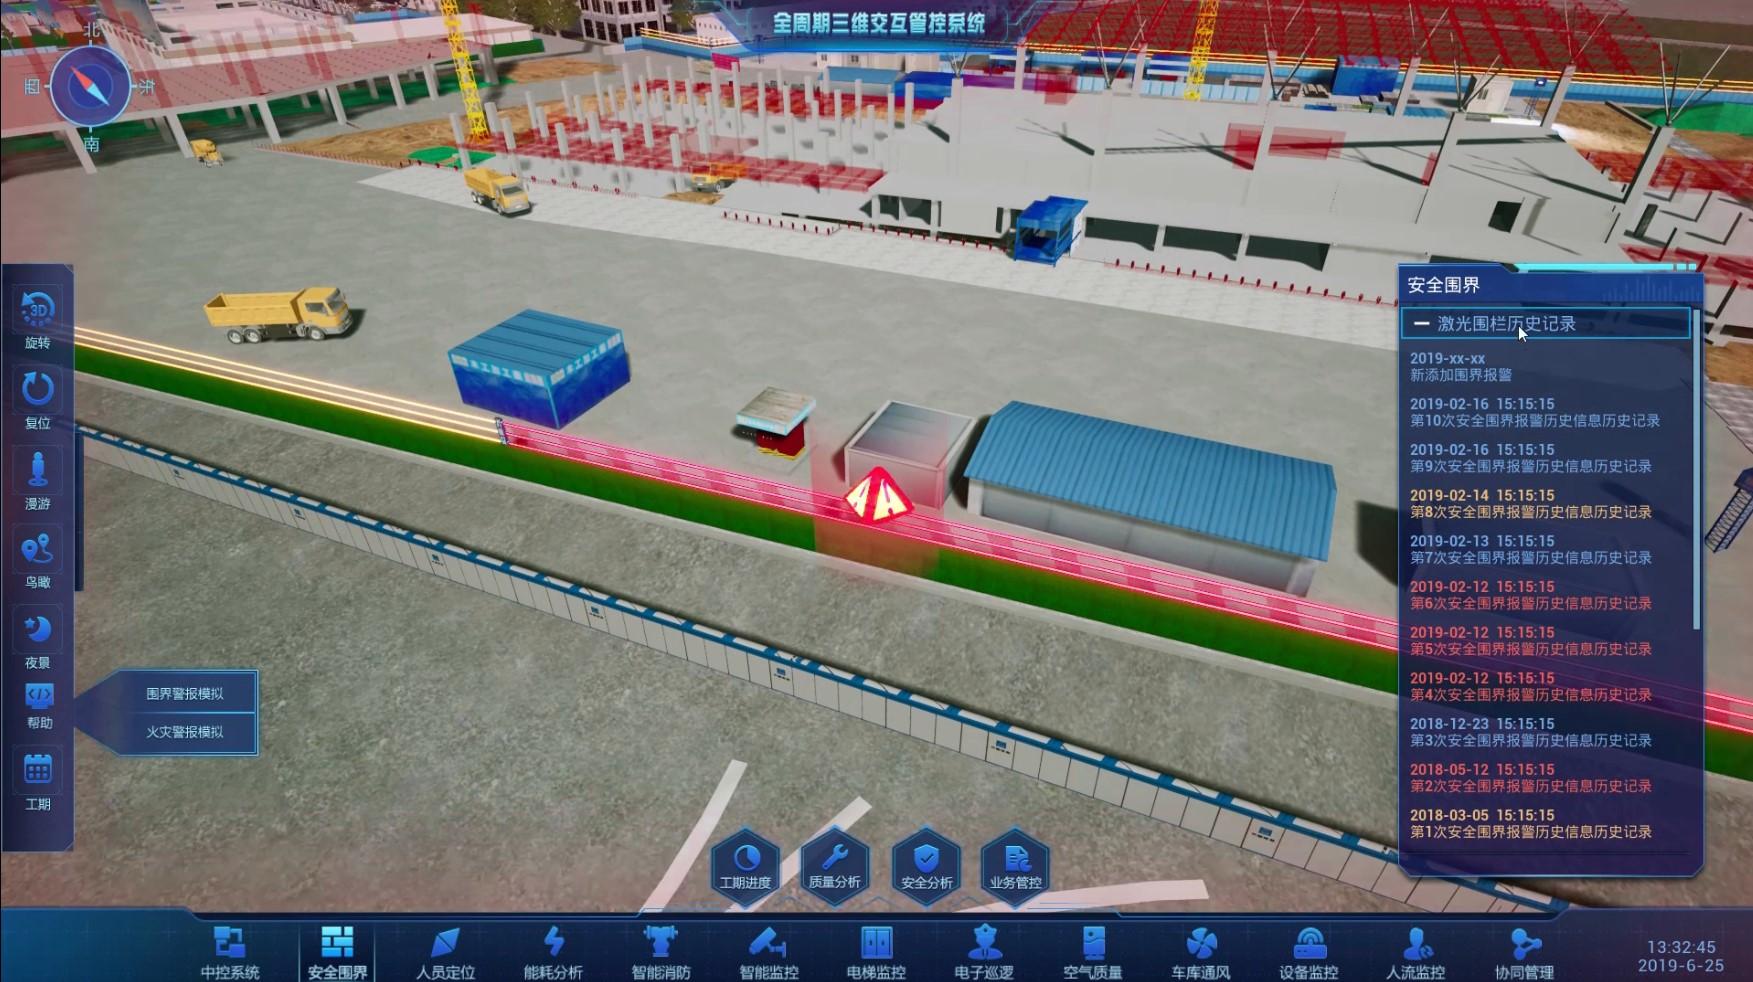 BIM技术在机场工程精细化管理的应用